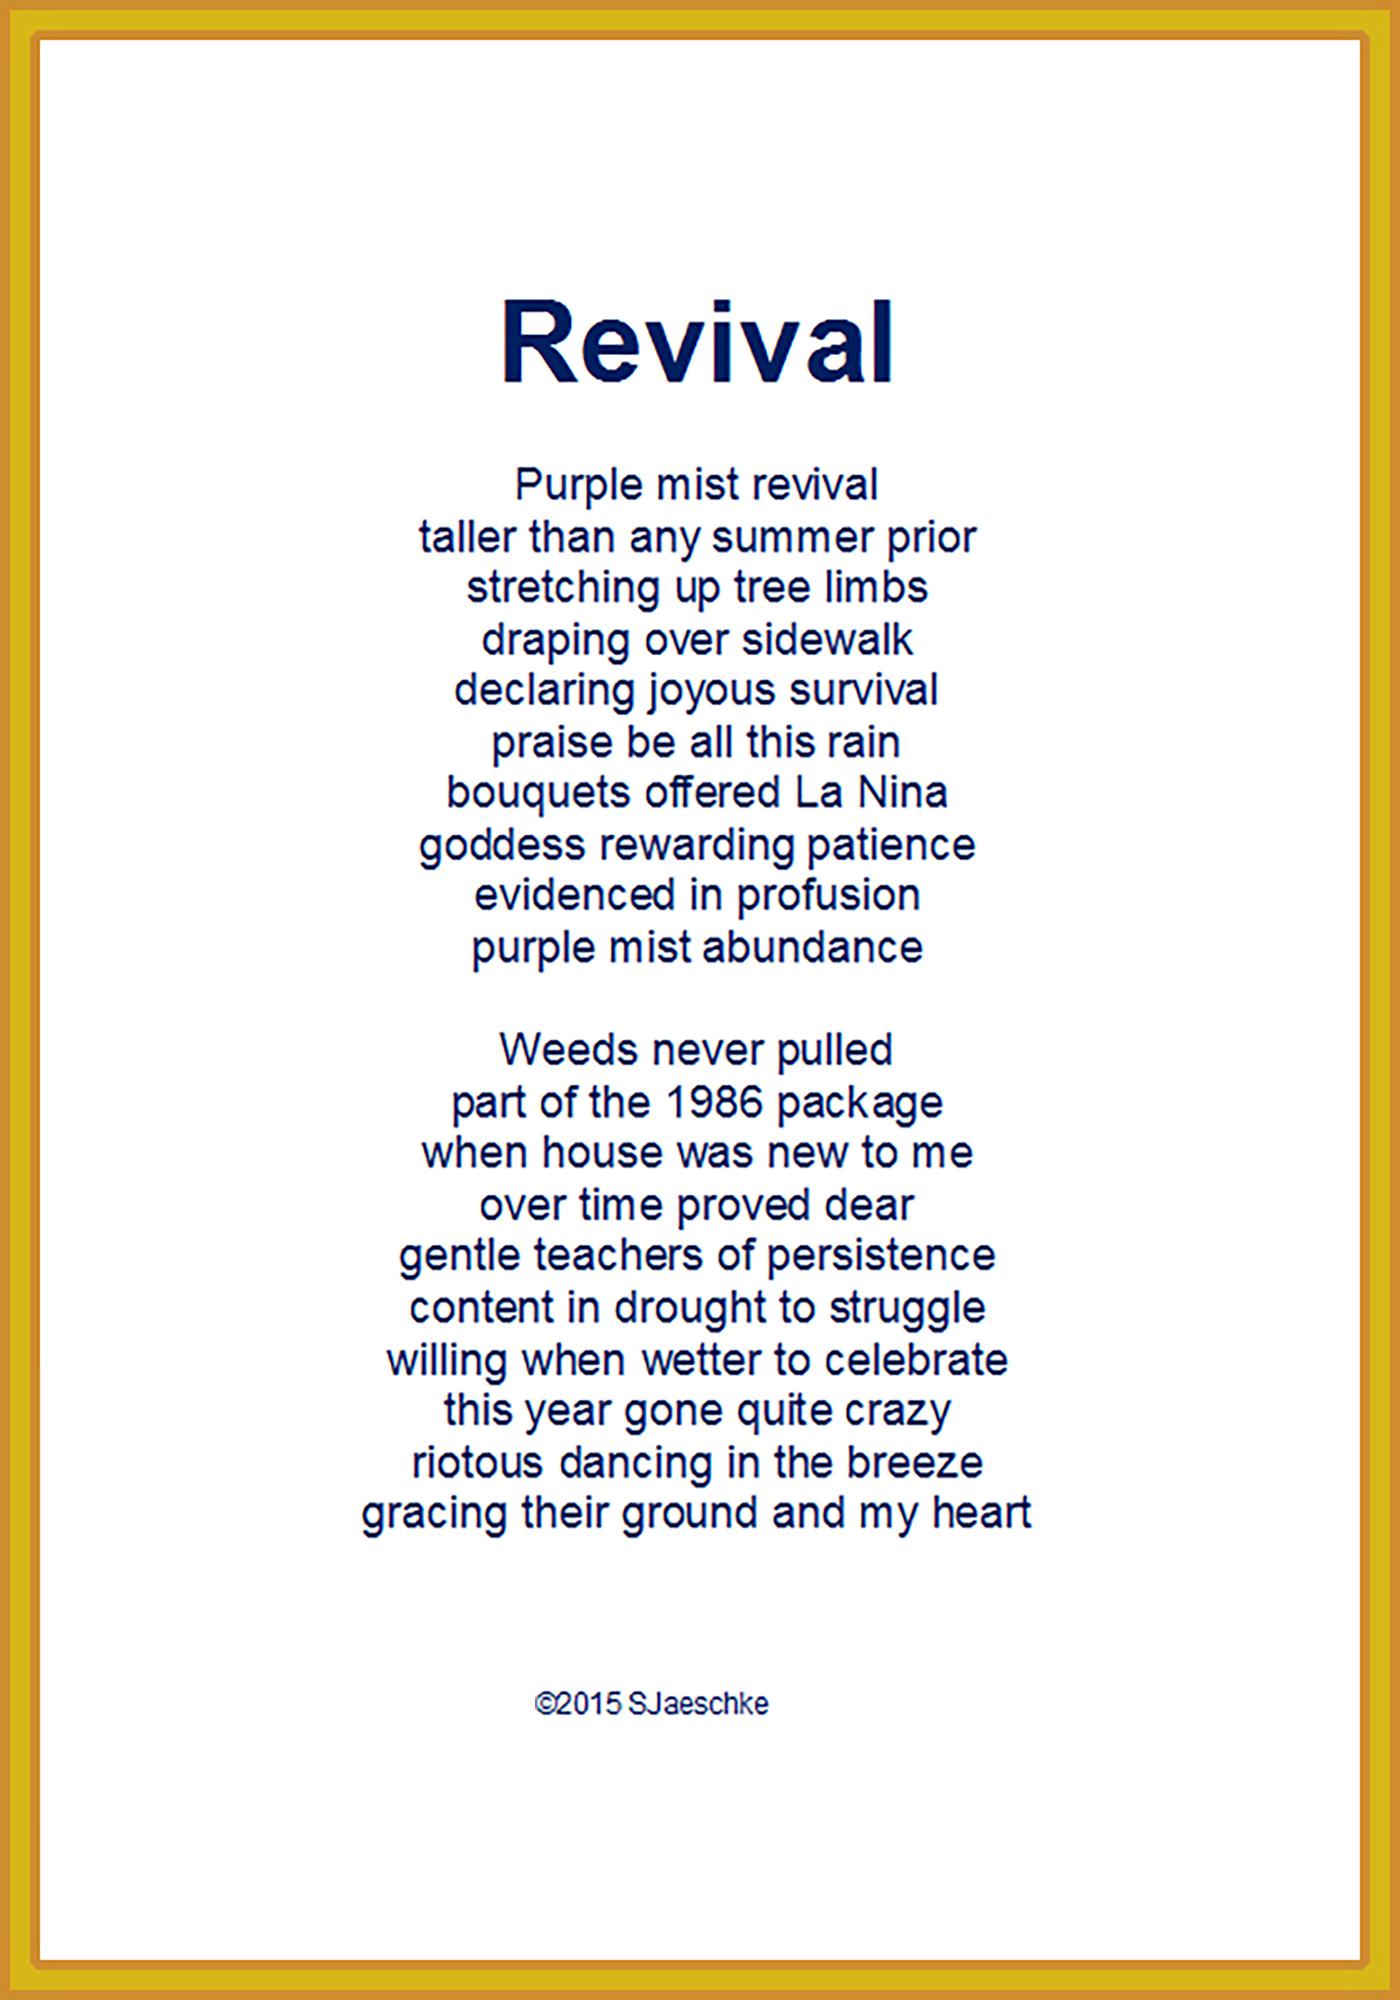 Post_2015-06-23_Poem_Revival